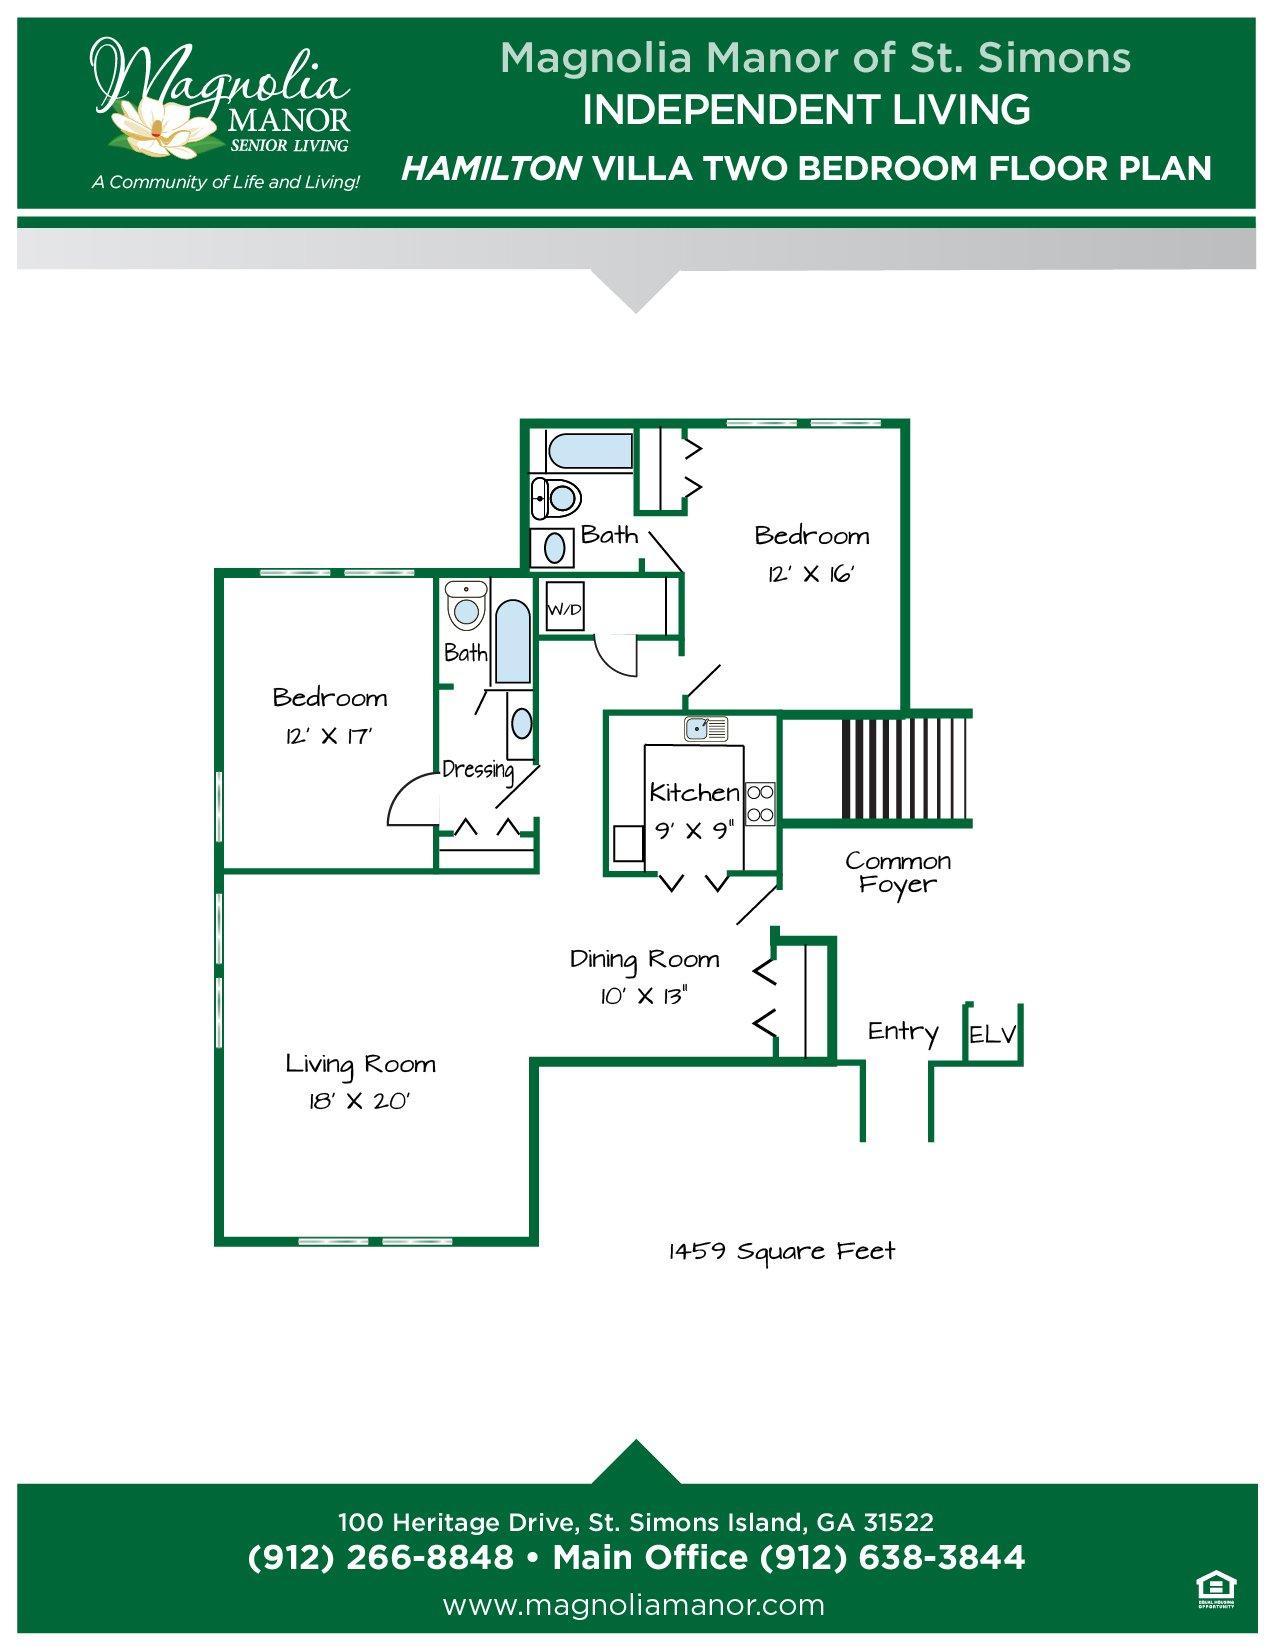 00344 St Simons IL HAMILTON VILLA Floor Plans 2019-01